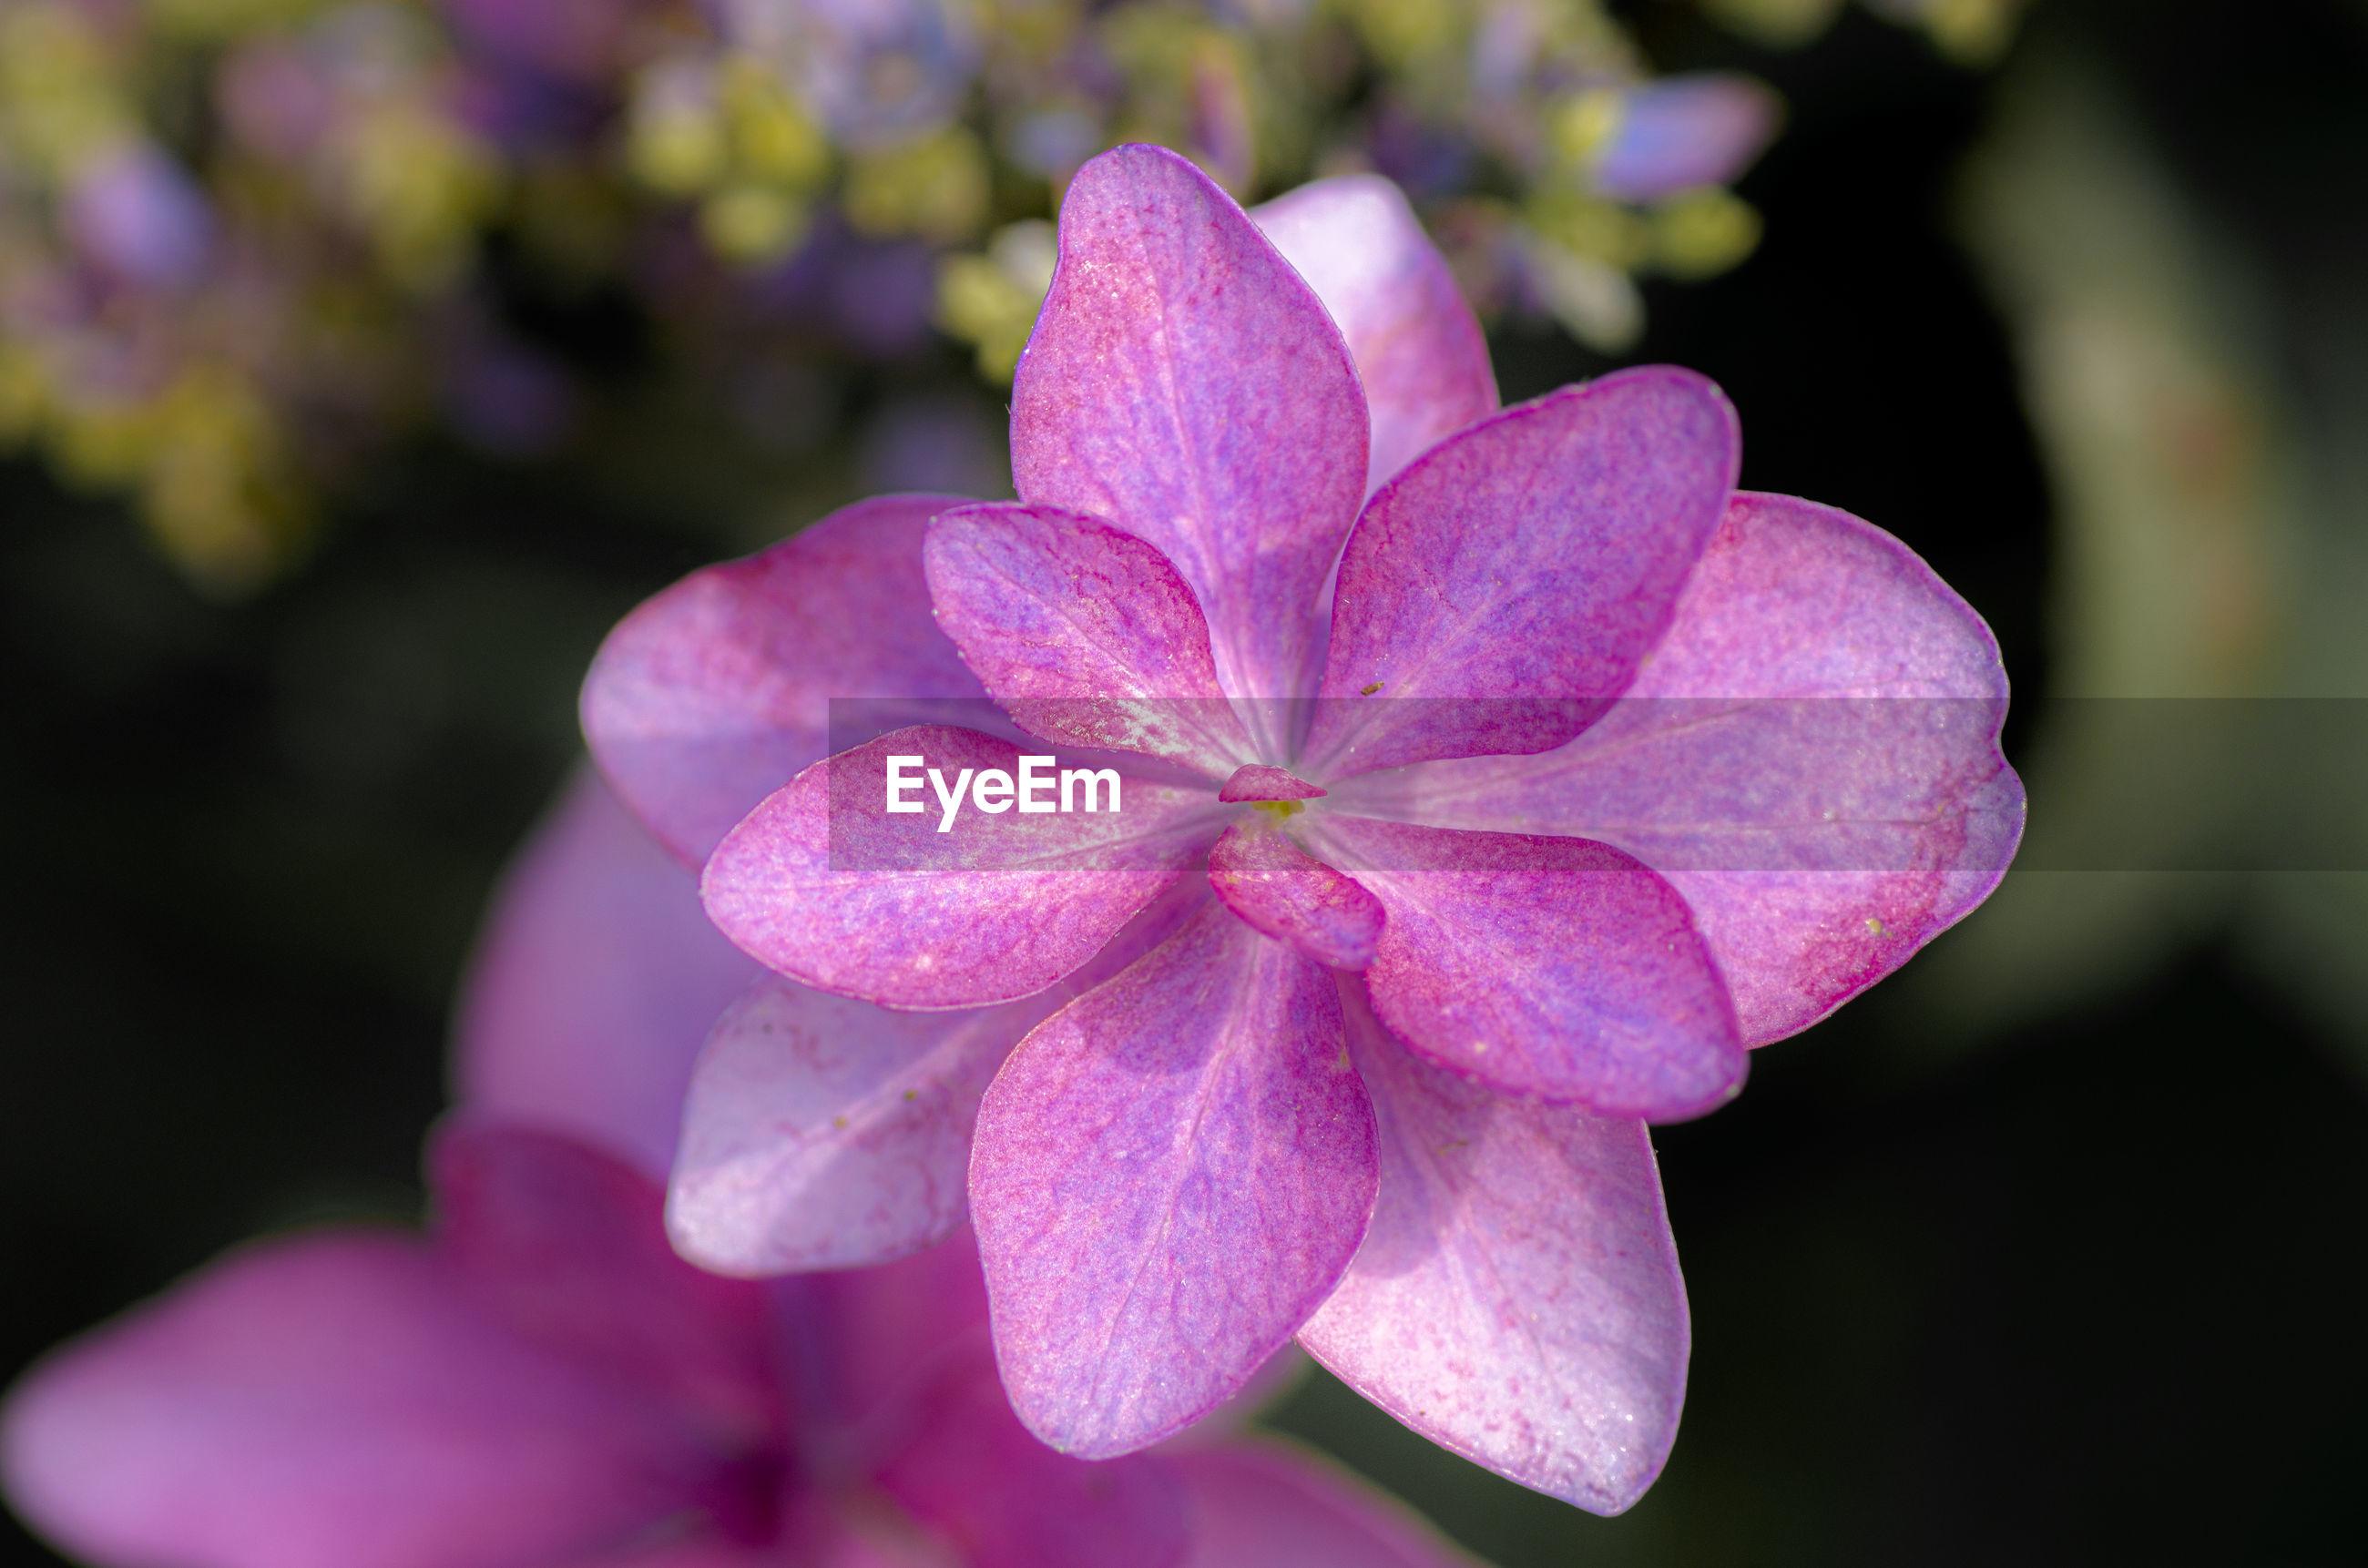 CLOSE-UP OF FRESH PINK ROSE FLOWER